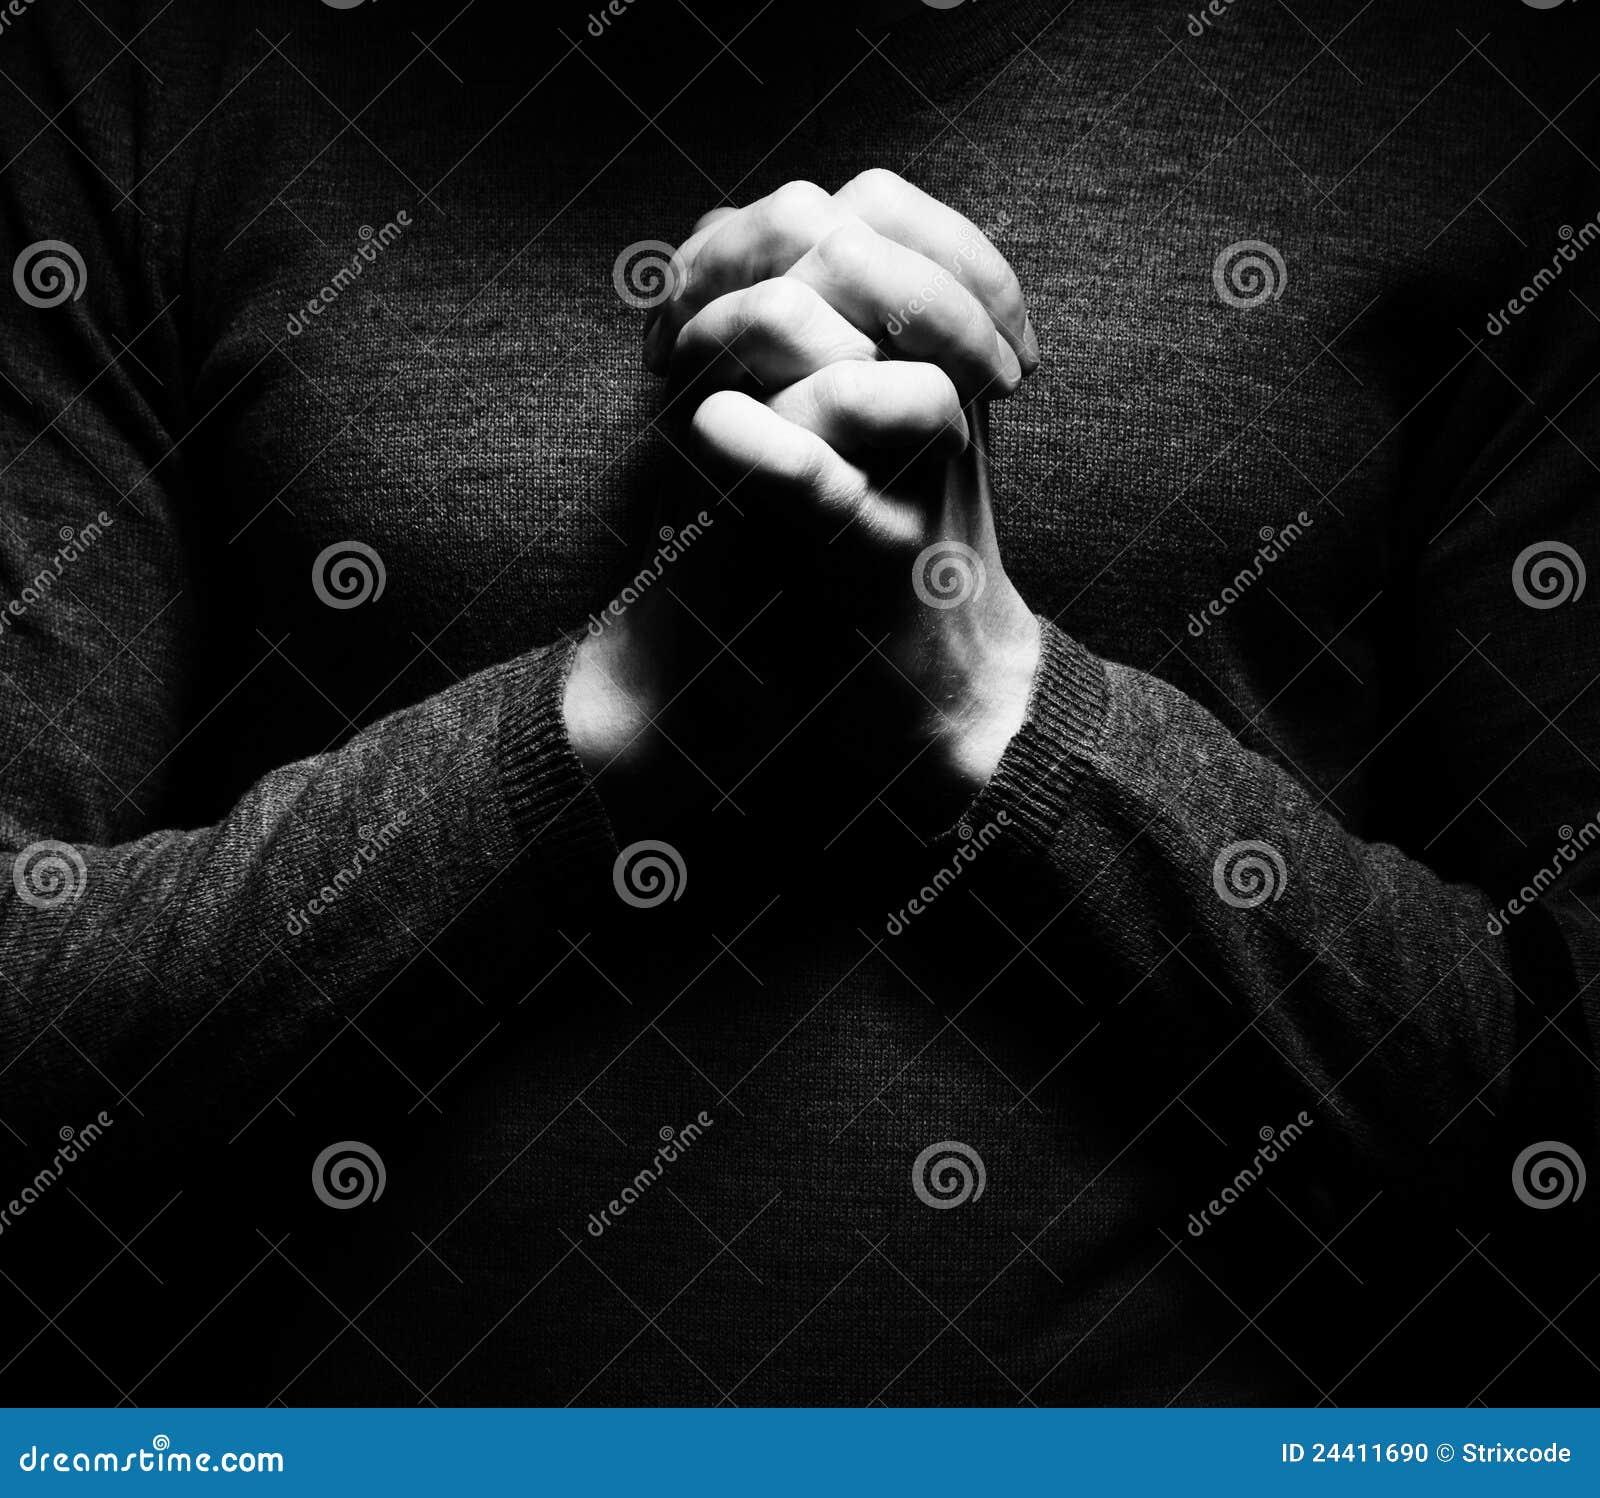 Image of prayer